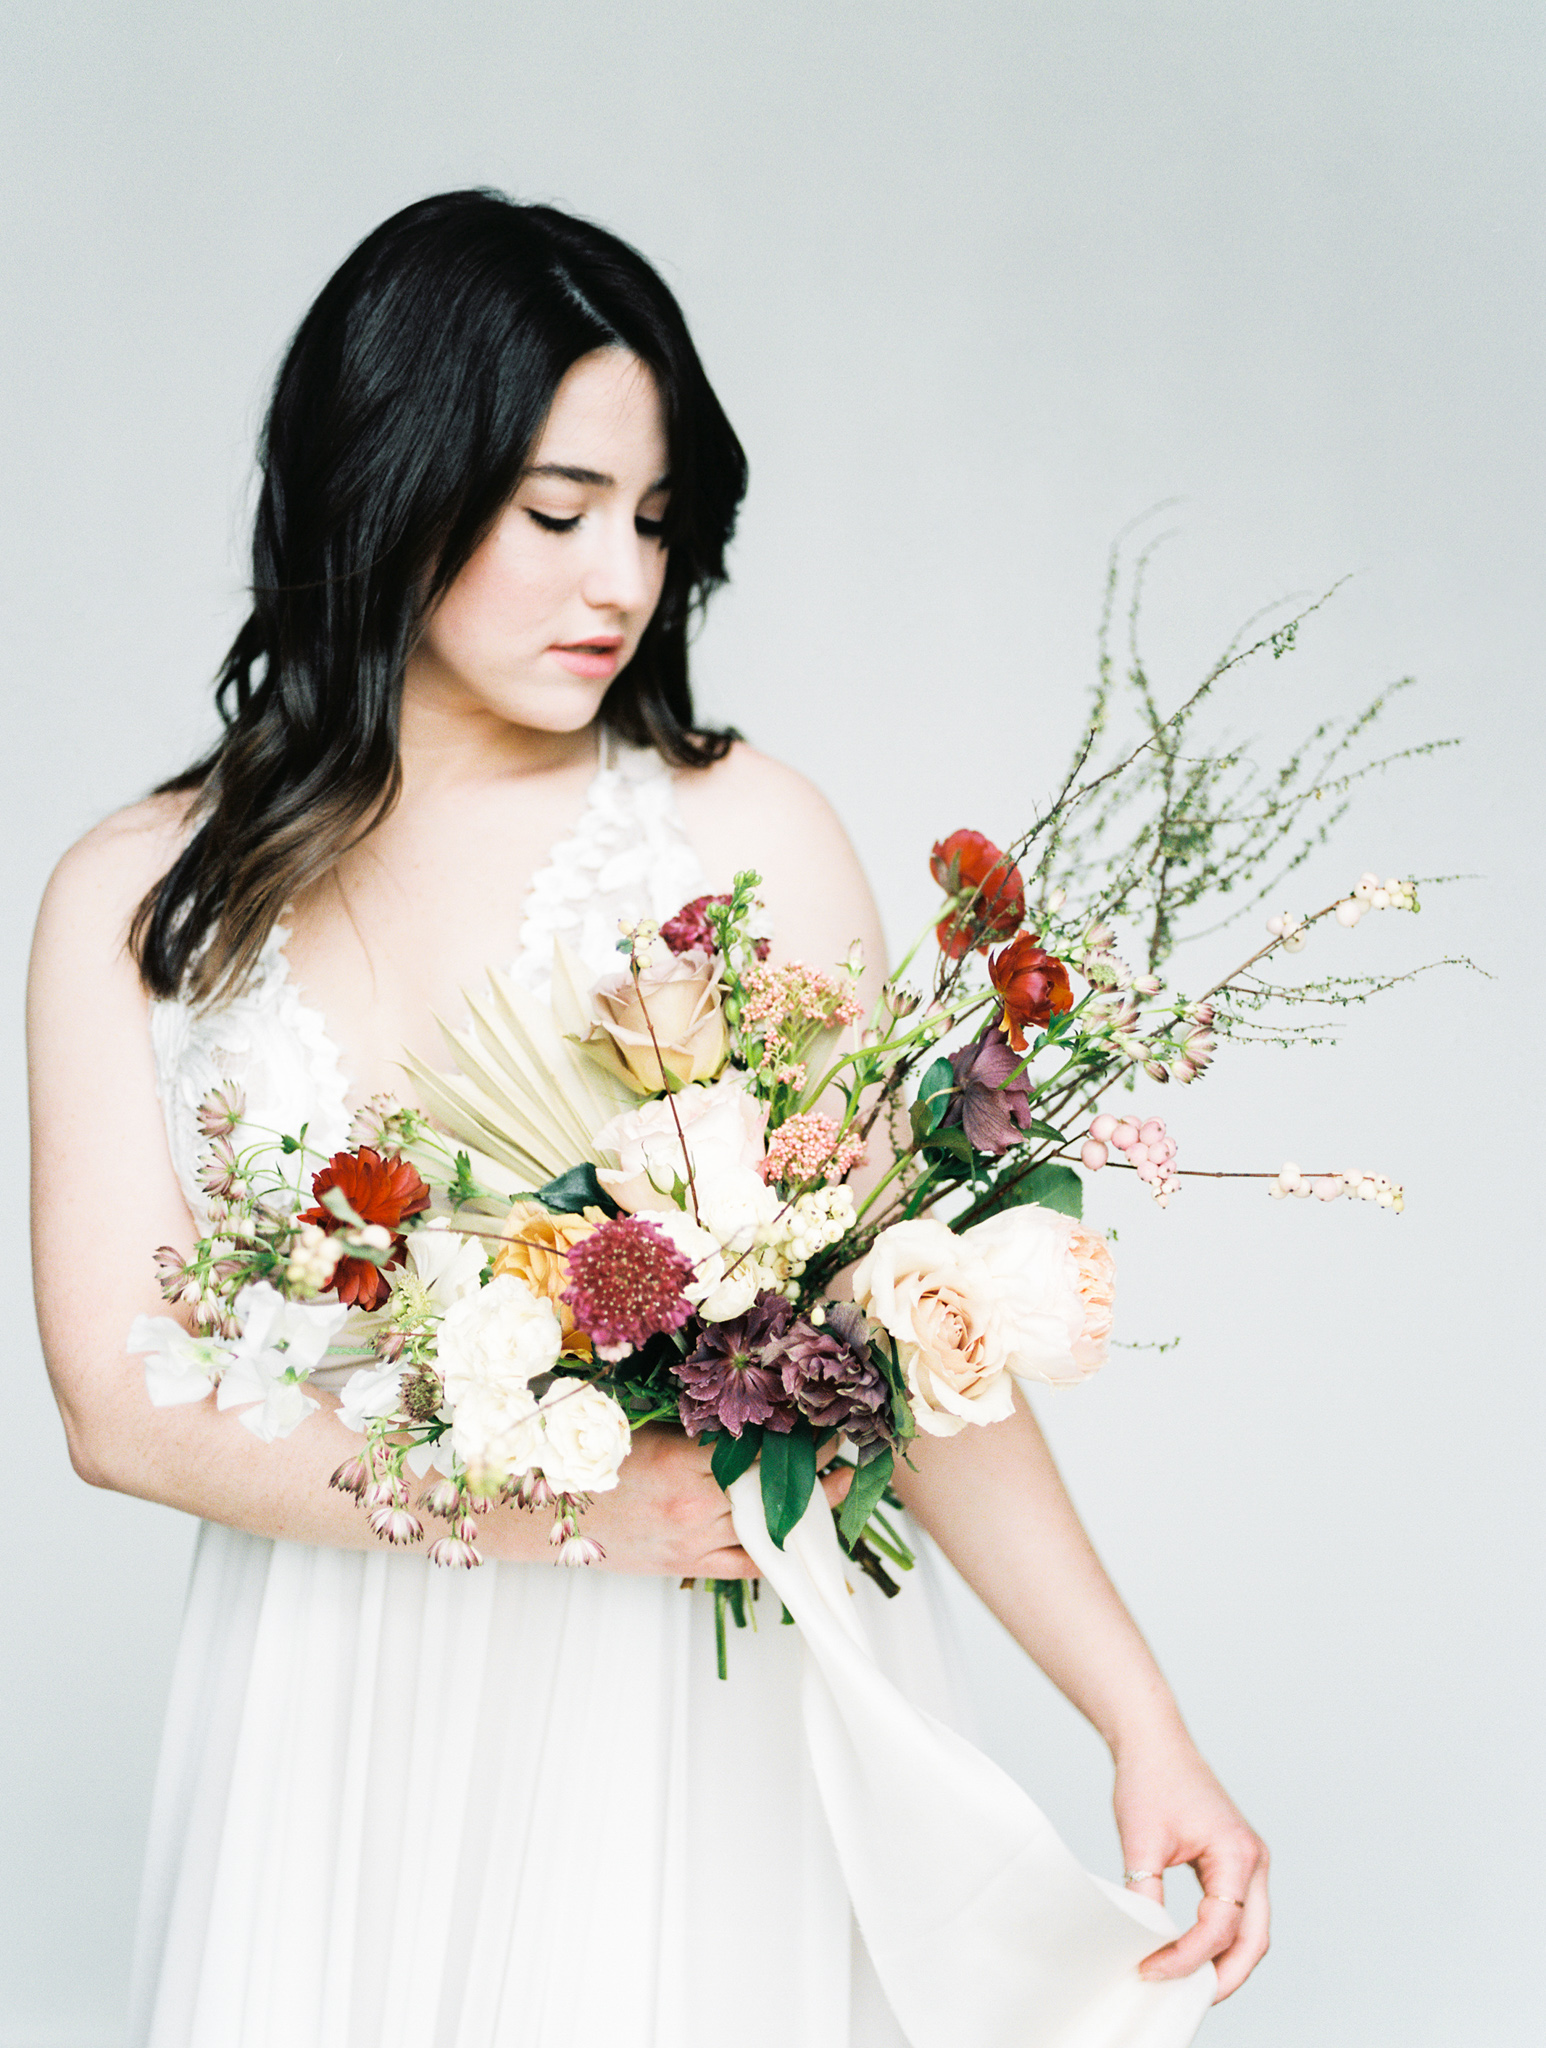 Cultivate Goods Floral Workshop - The Doyle - Kristen Krehbiel - Kristen Kay Photography-74.jpg